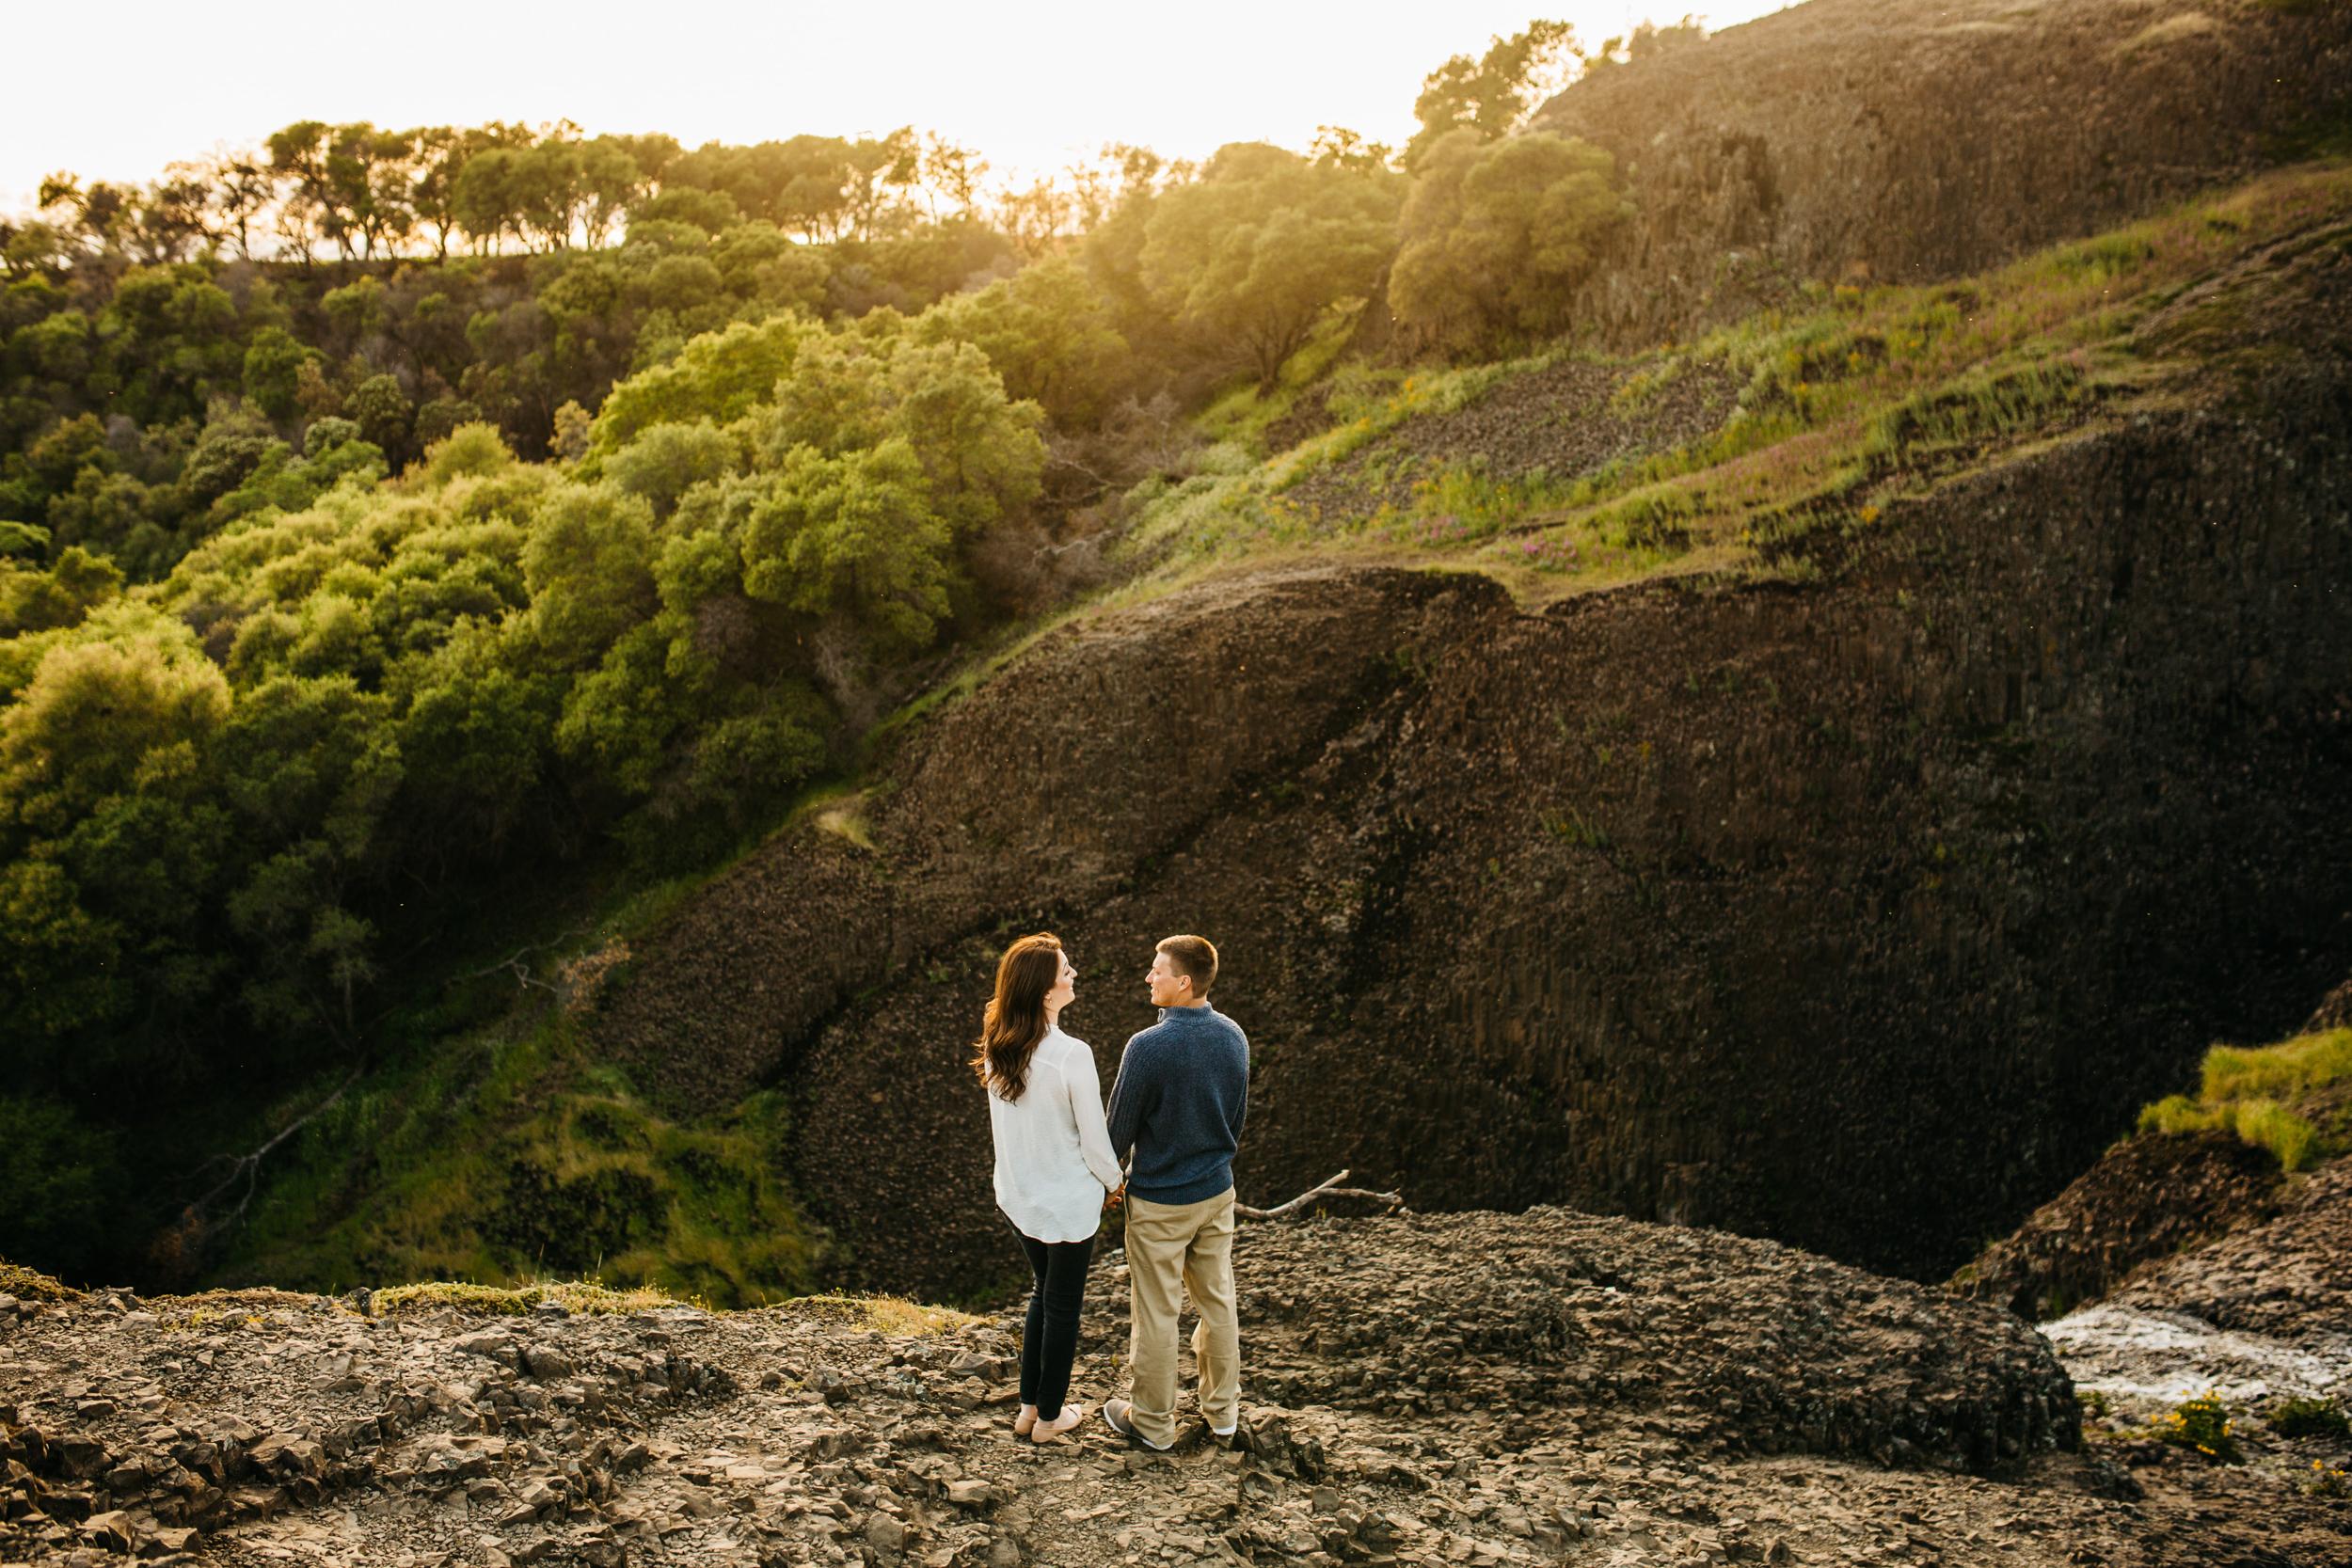 Engagement Photos-Ranalla Photo and Films-56.jpg